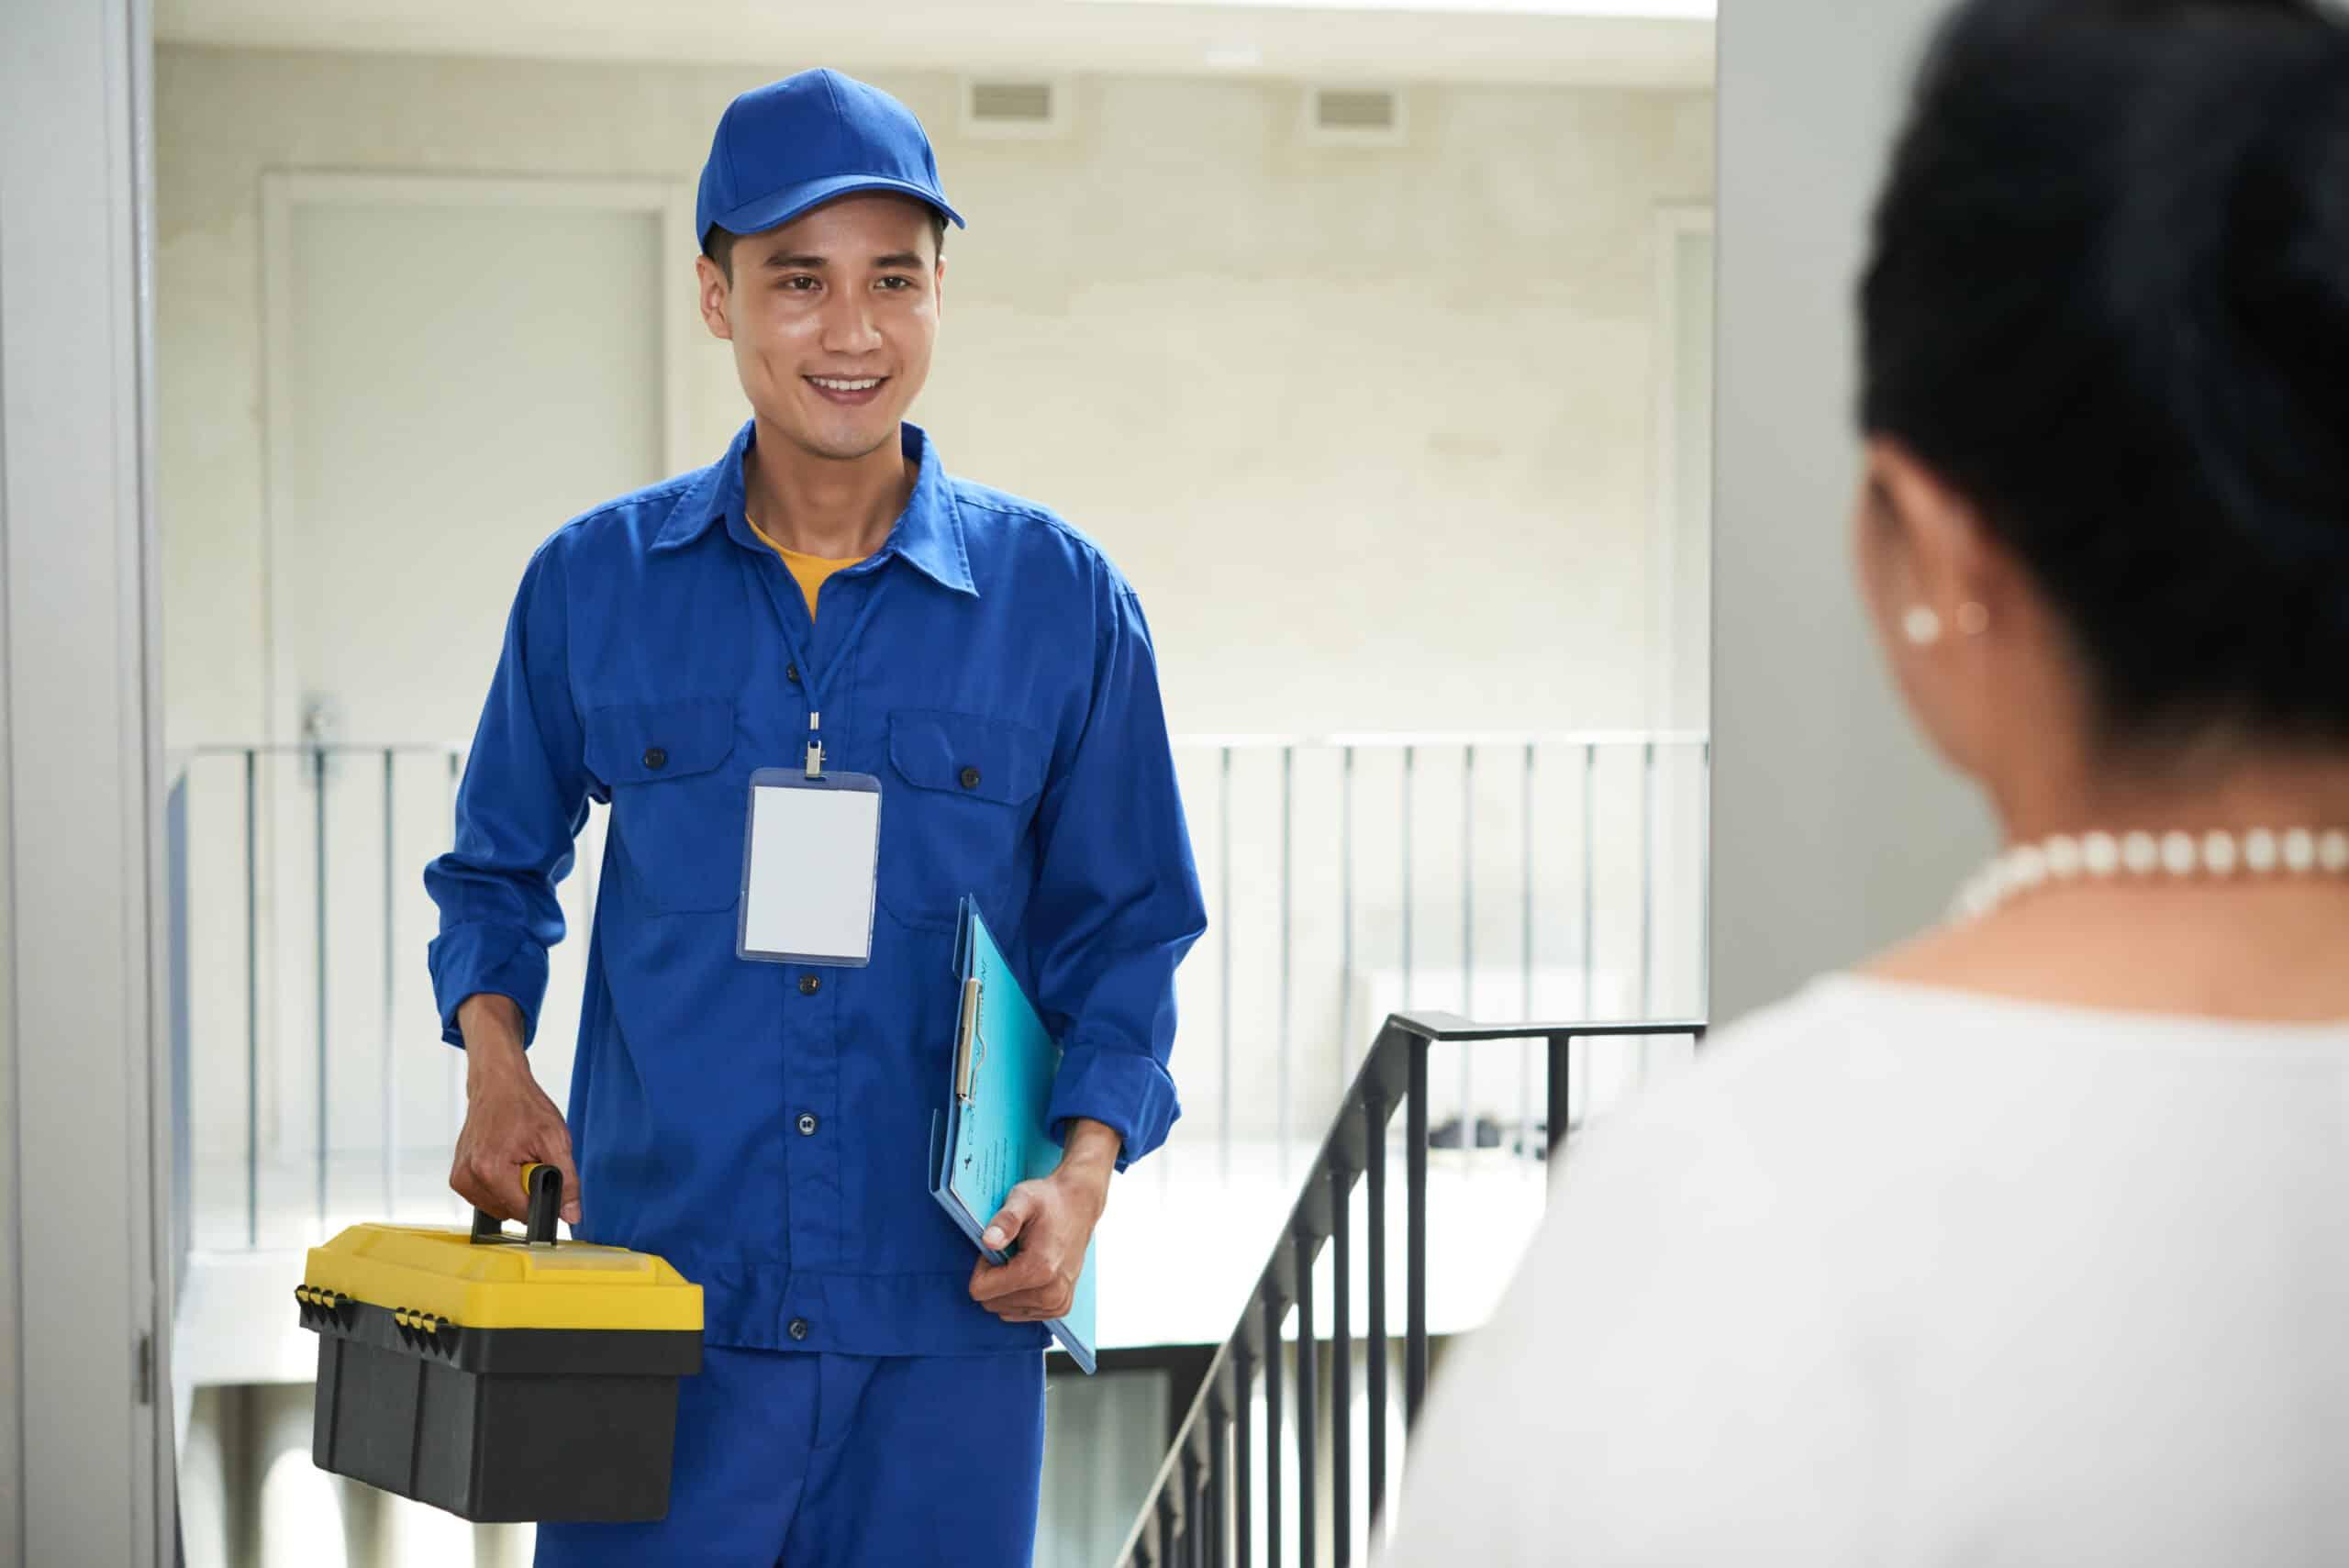 Cheerful Vietnamese handyman coming to home of senior woman to repair something